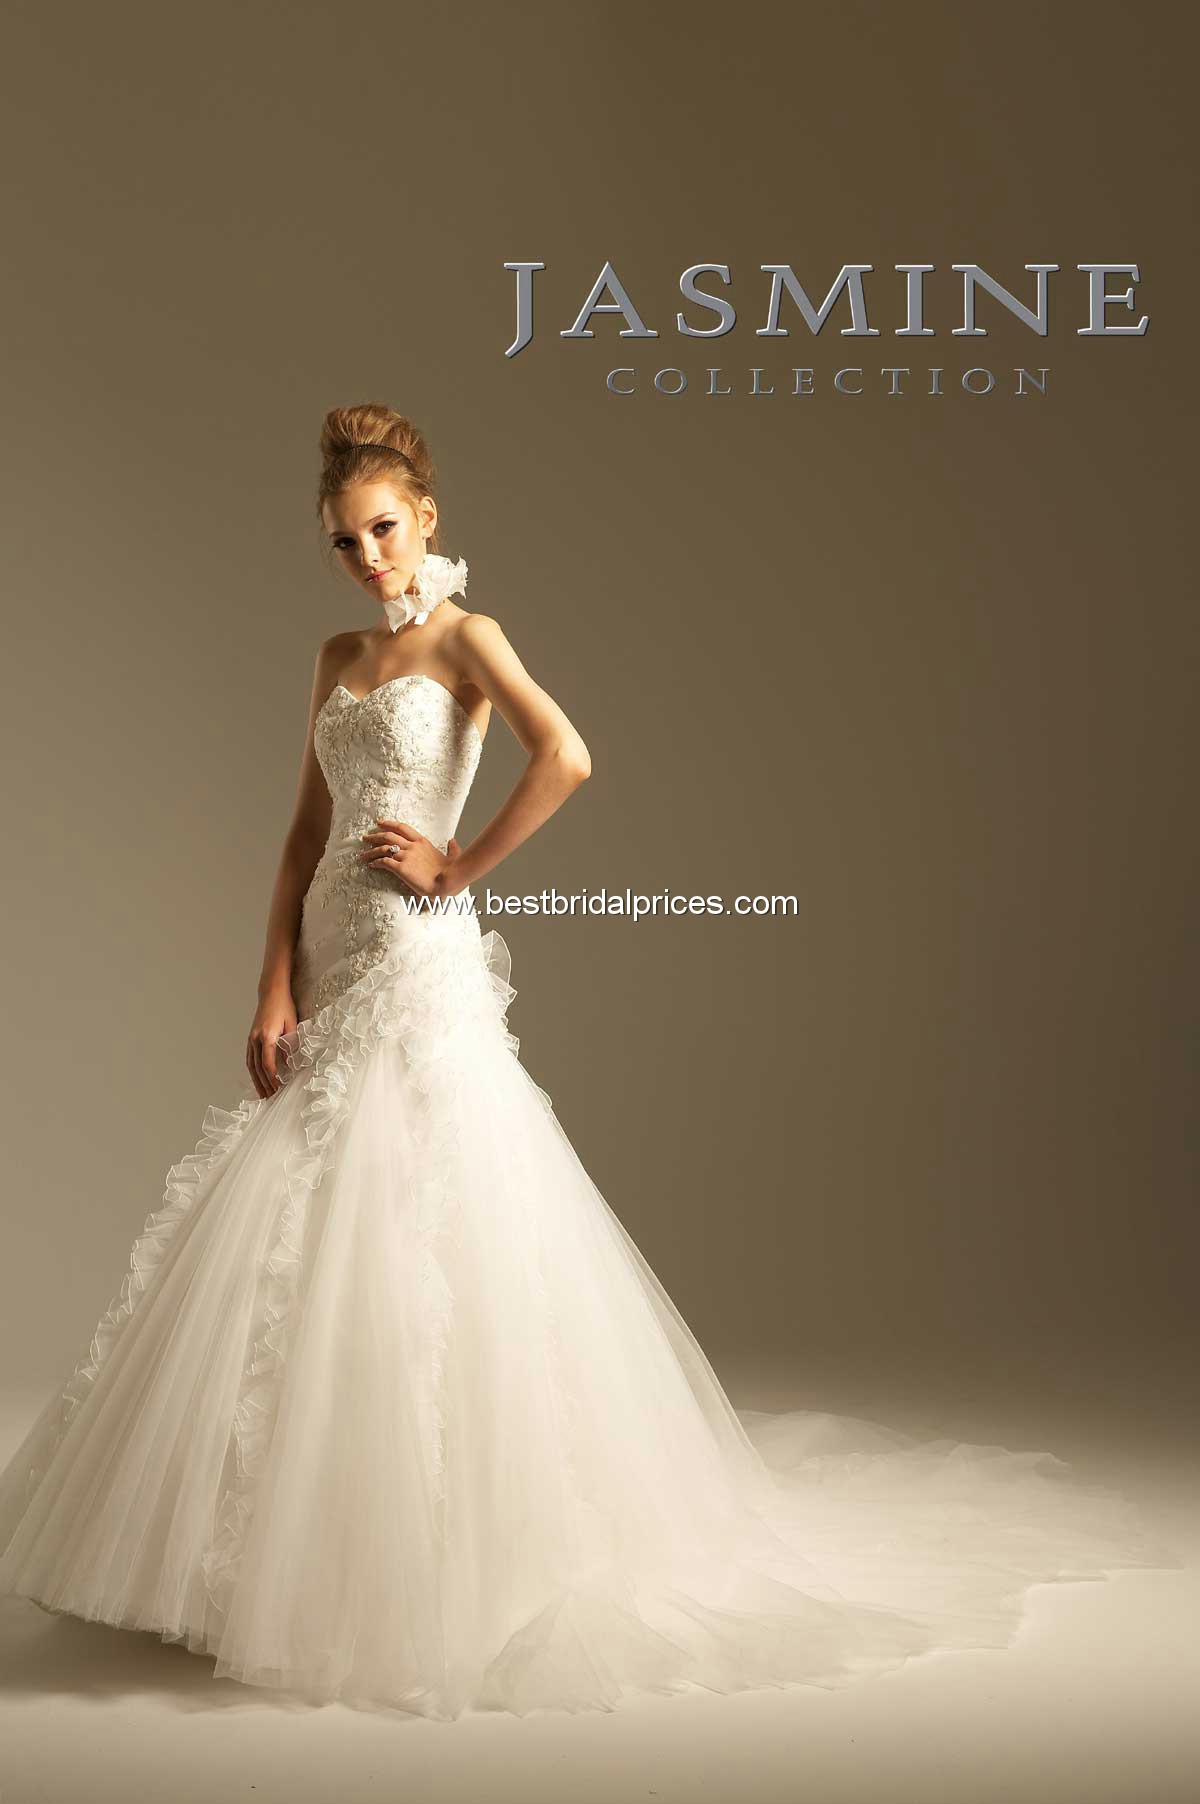 jasmine collection wedding dresses photo - 1